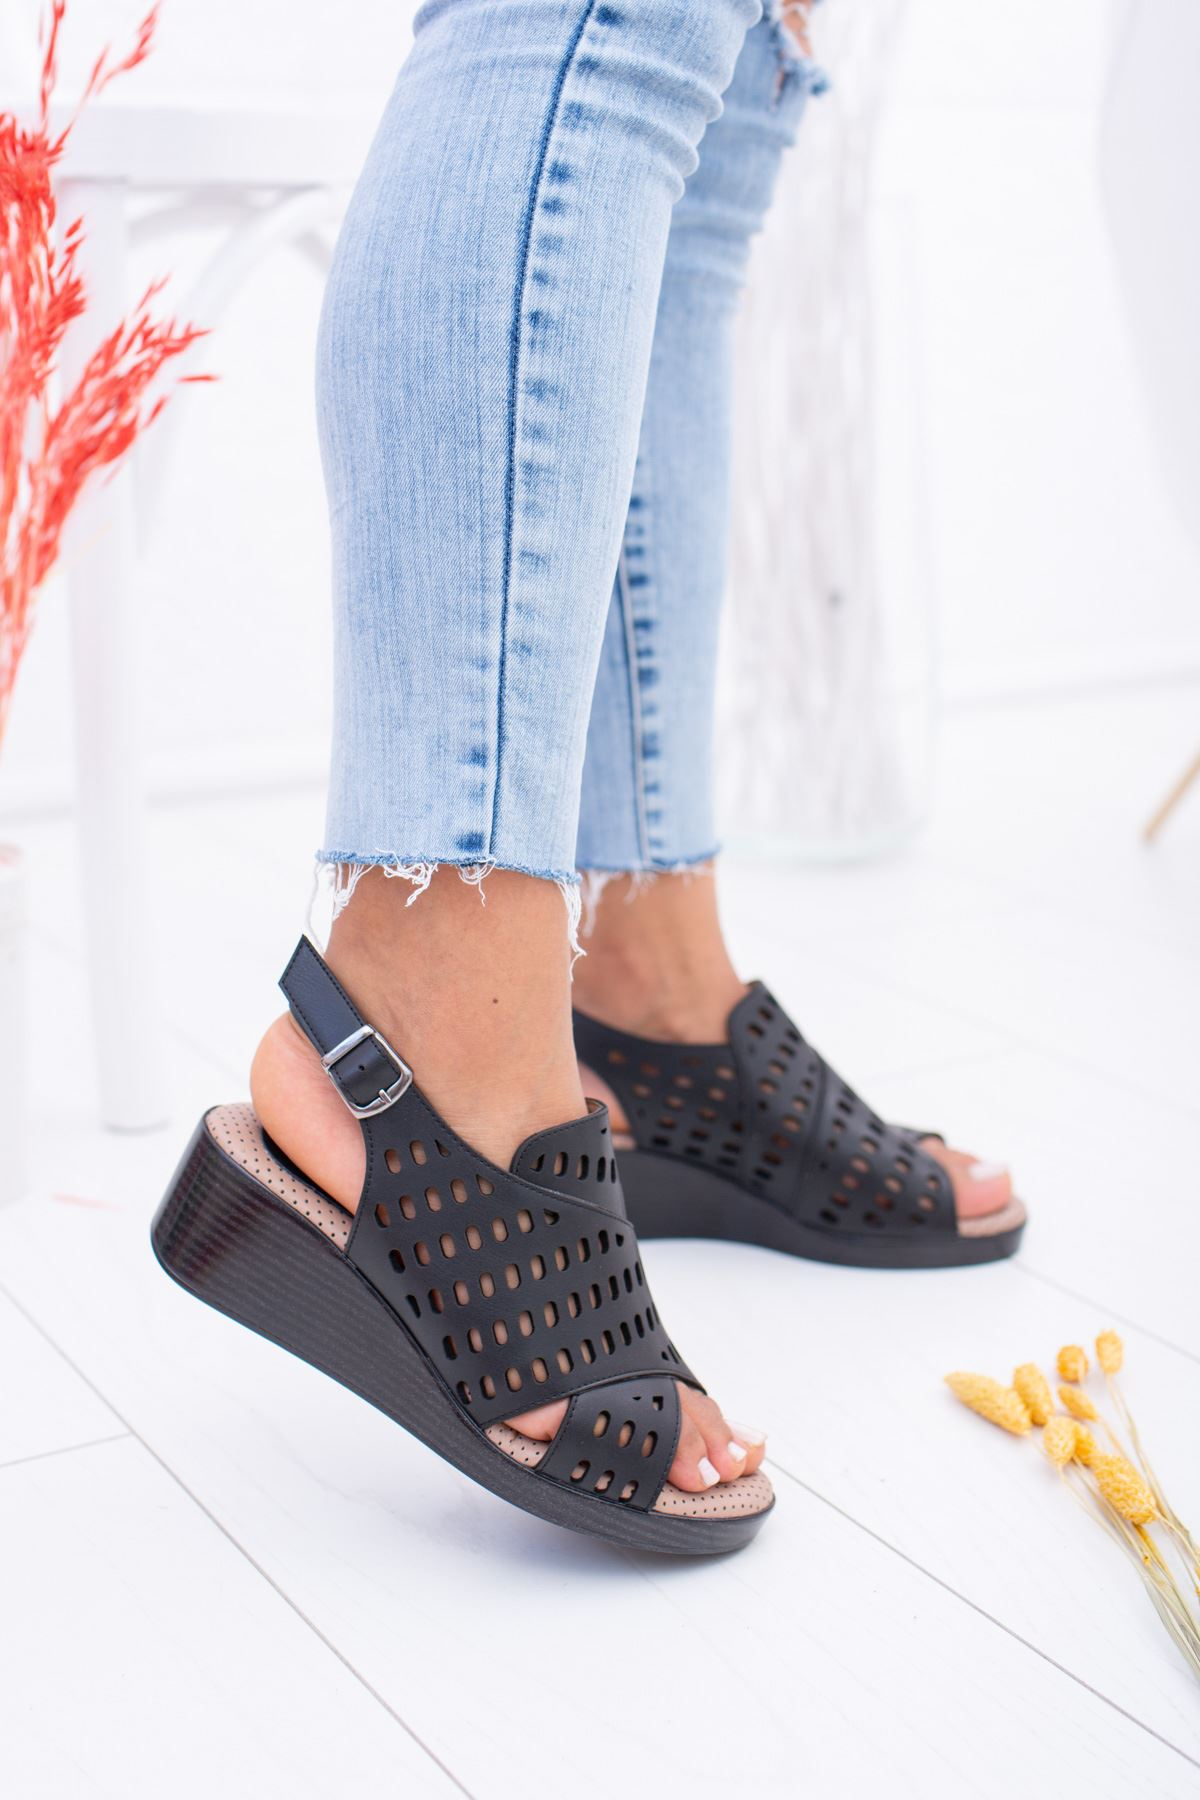 Lazerli Dolgu Taban Ortopedik Siyah Sandalet